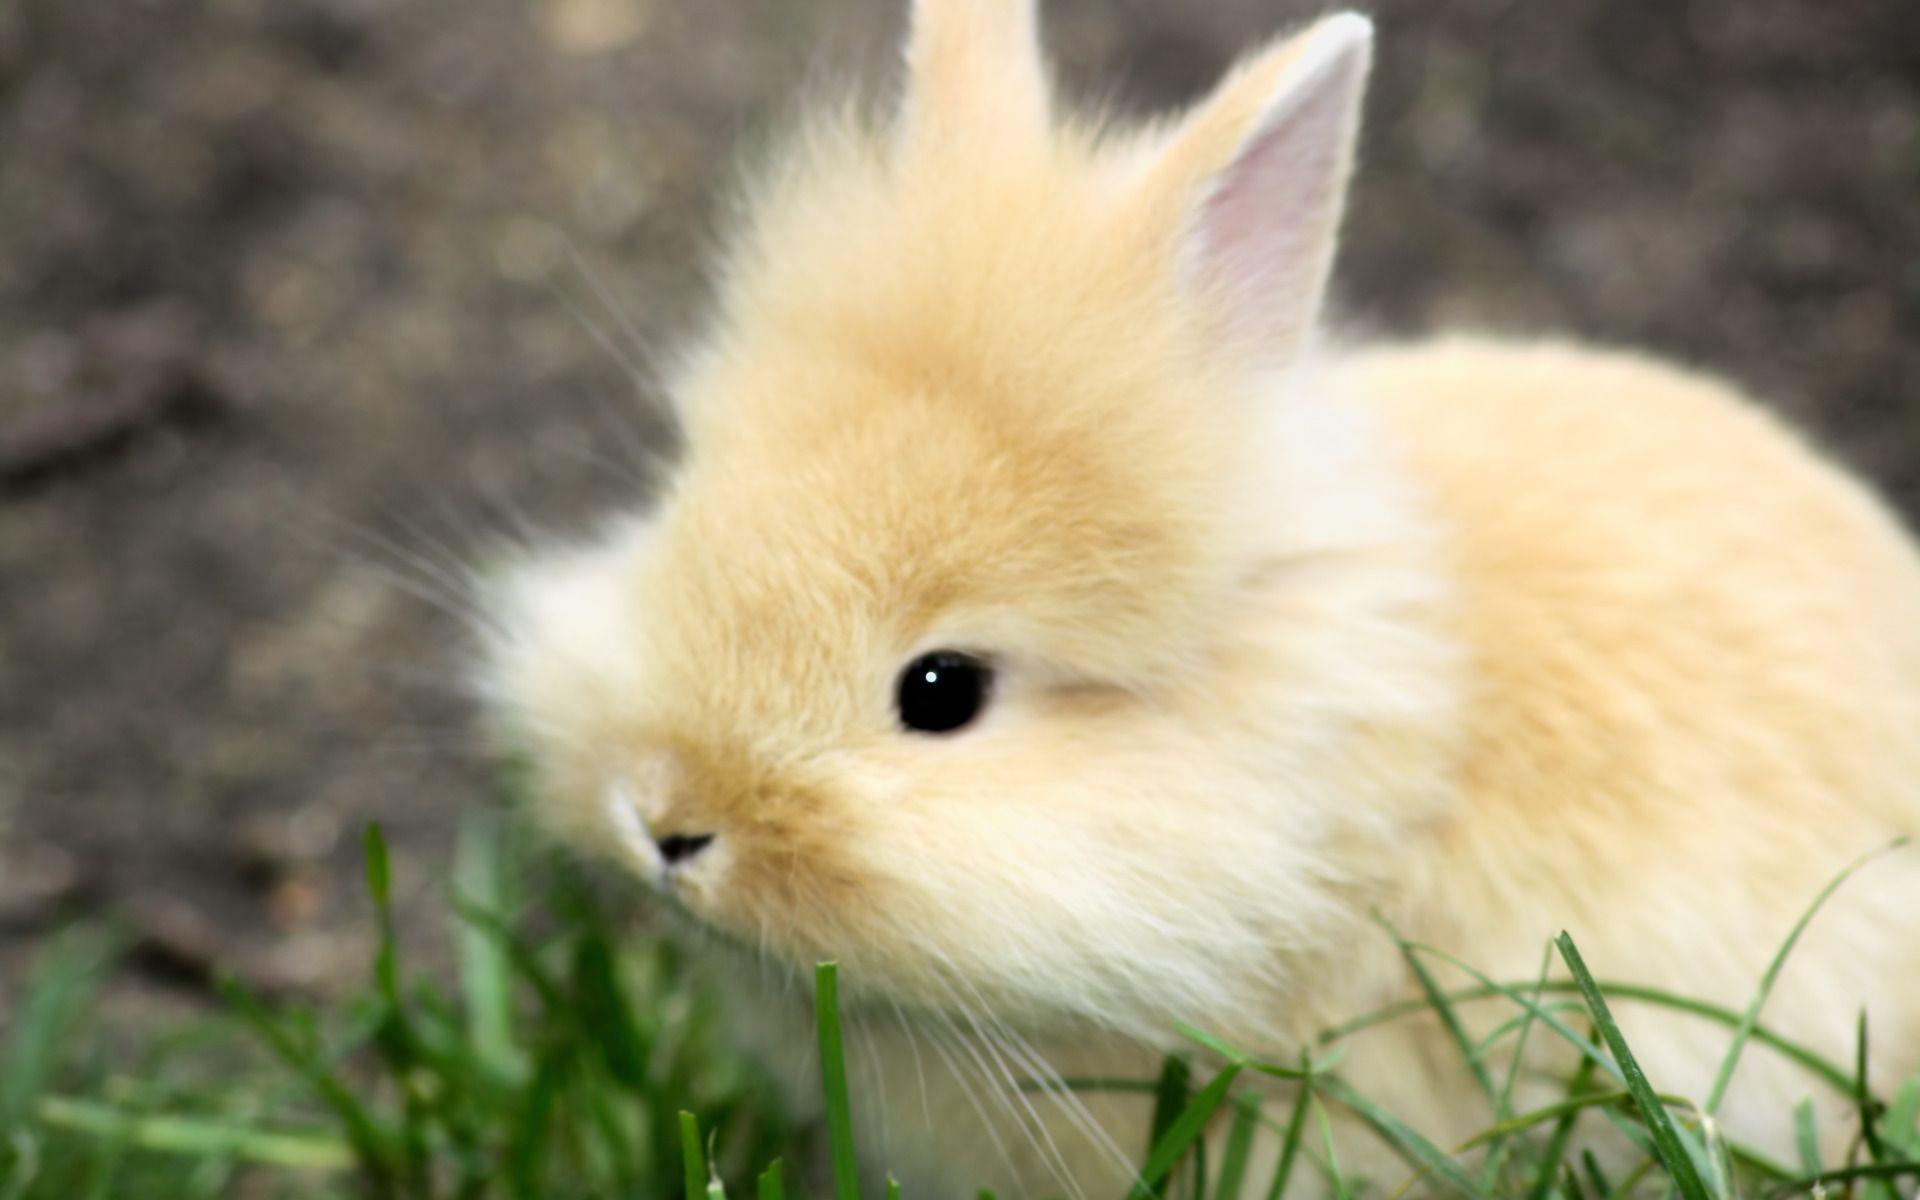 Cute Baby Bunny Photo Cute Bunny Pictures Cute Baby Bunnies